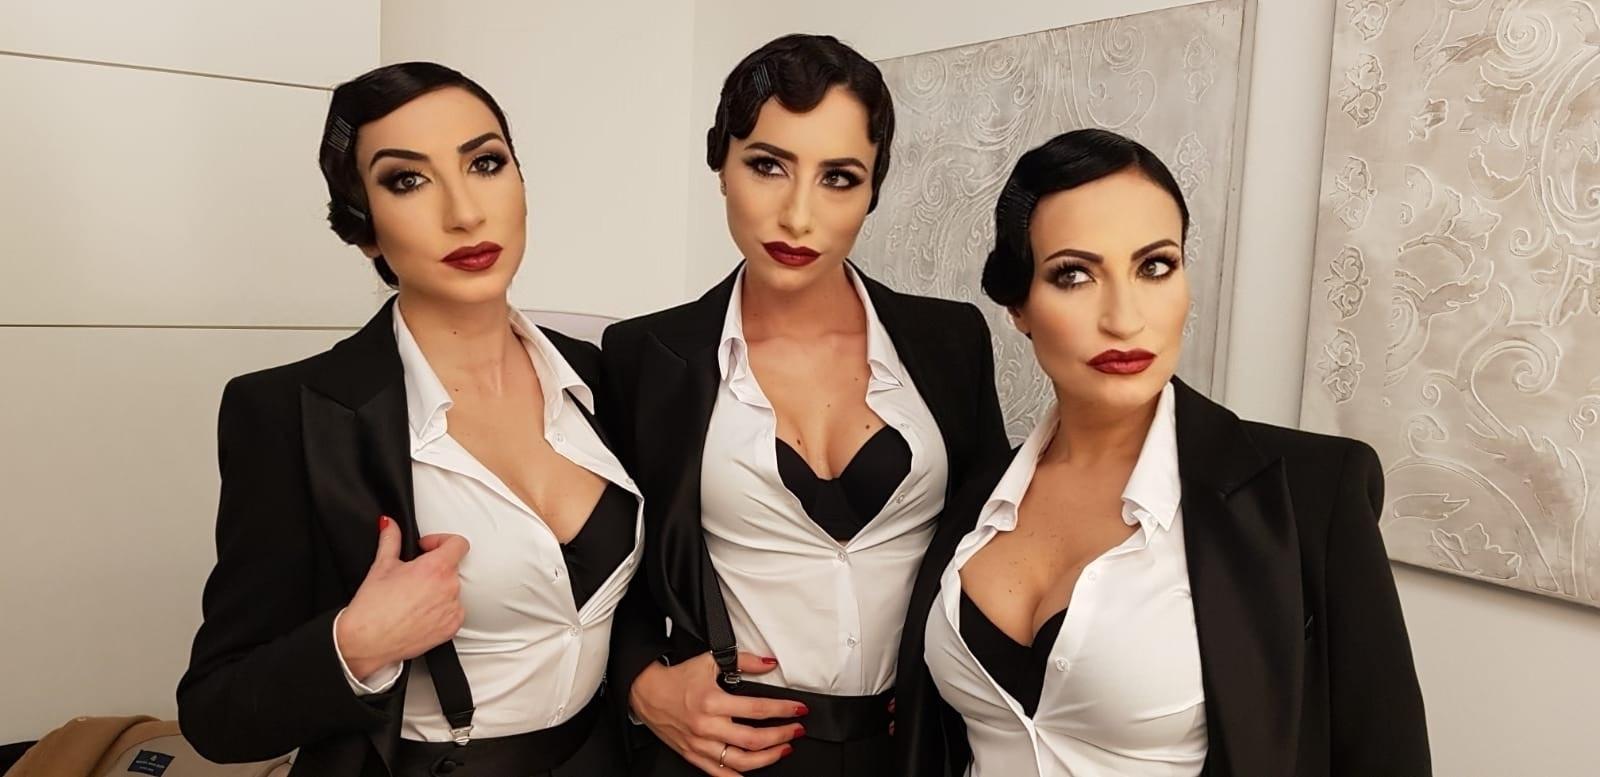 Mara, Giorgia and Stefania - Milan, Italy